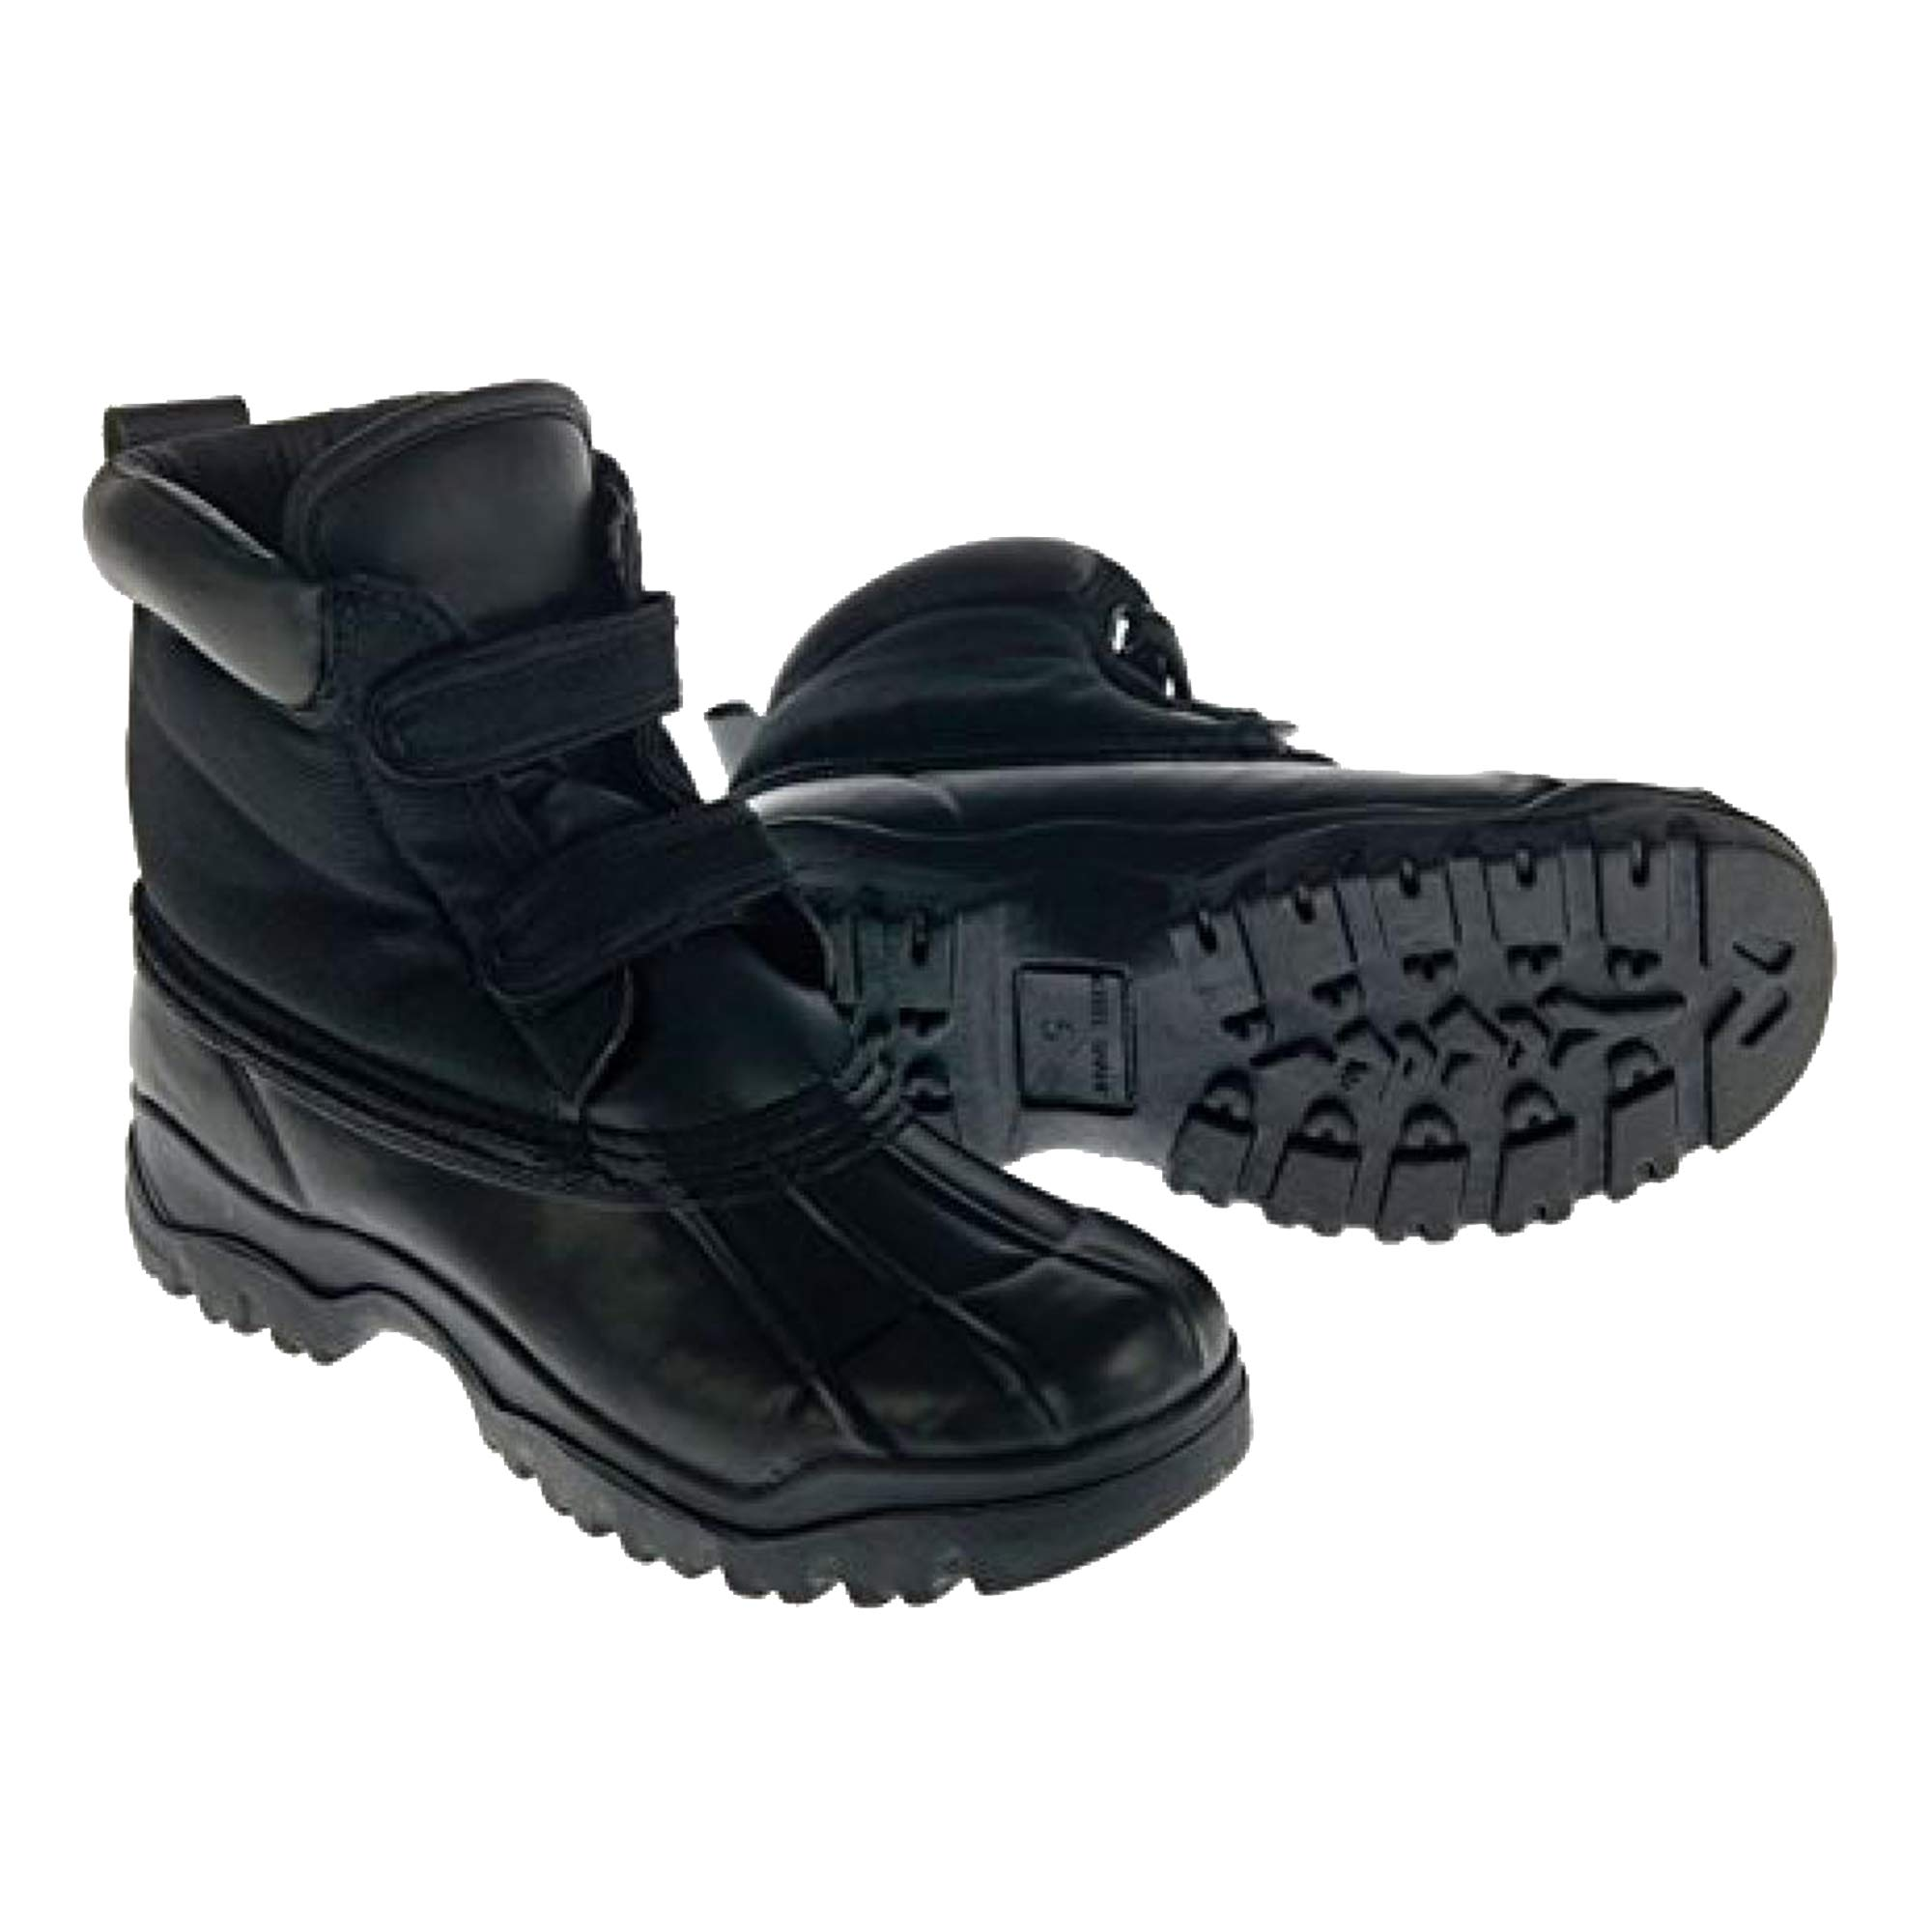 Dublin Childrens/Kids Yardmaster Touch Fastening Boots (Juniors 3) (Black)